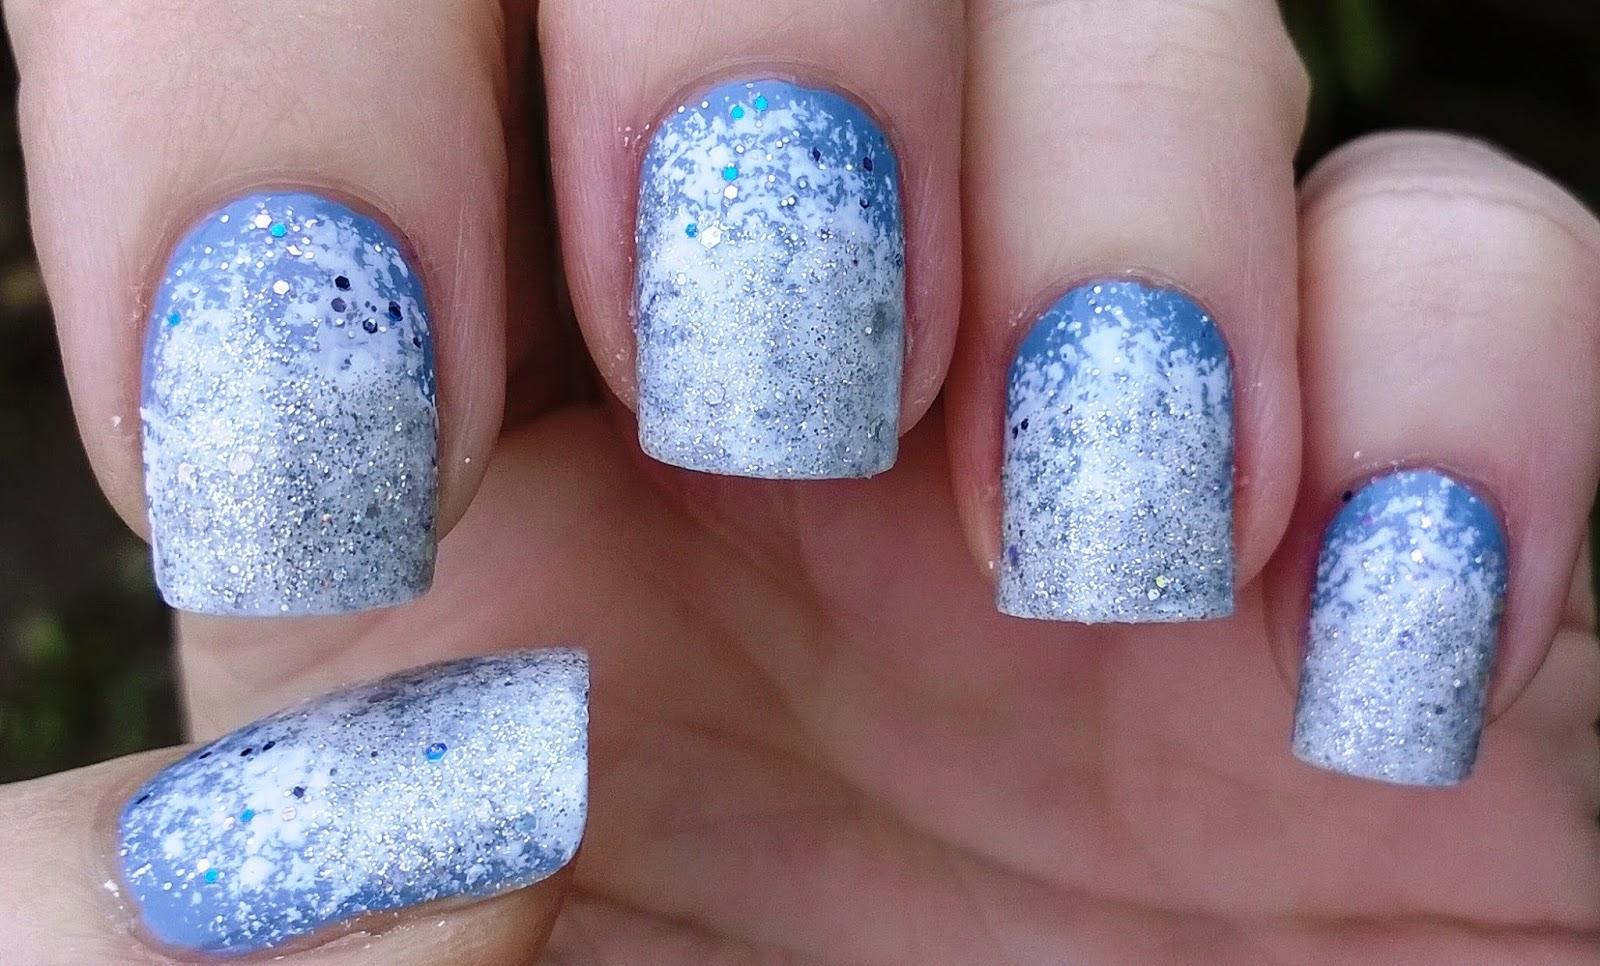 Life World Women: Frozen Elsa inspired sparkly nail art